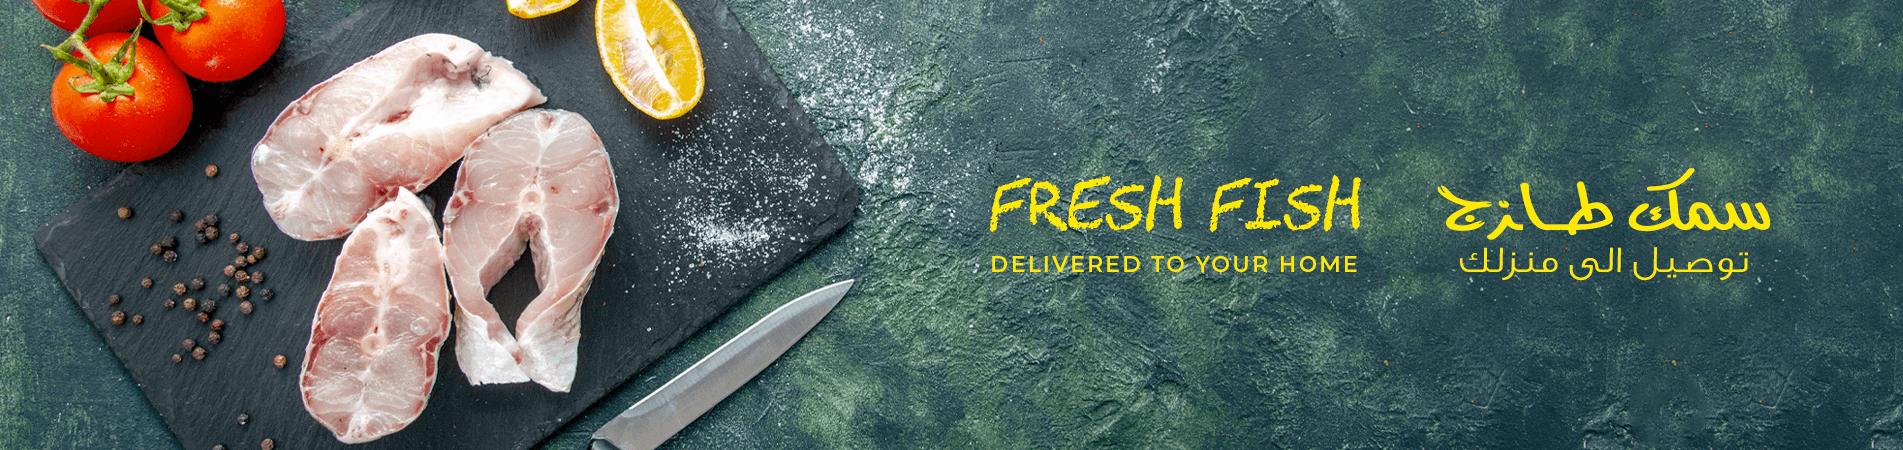 https://bazaar.om/fresh-meat-fish.html